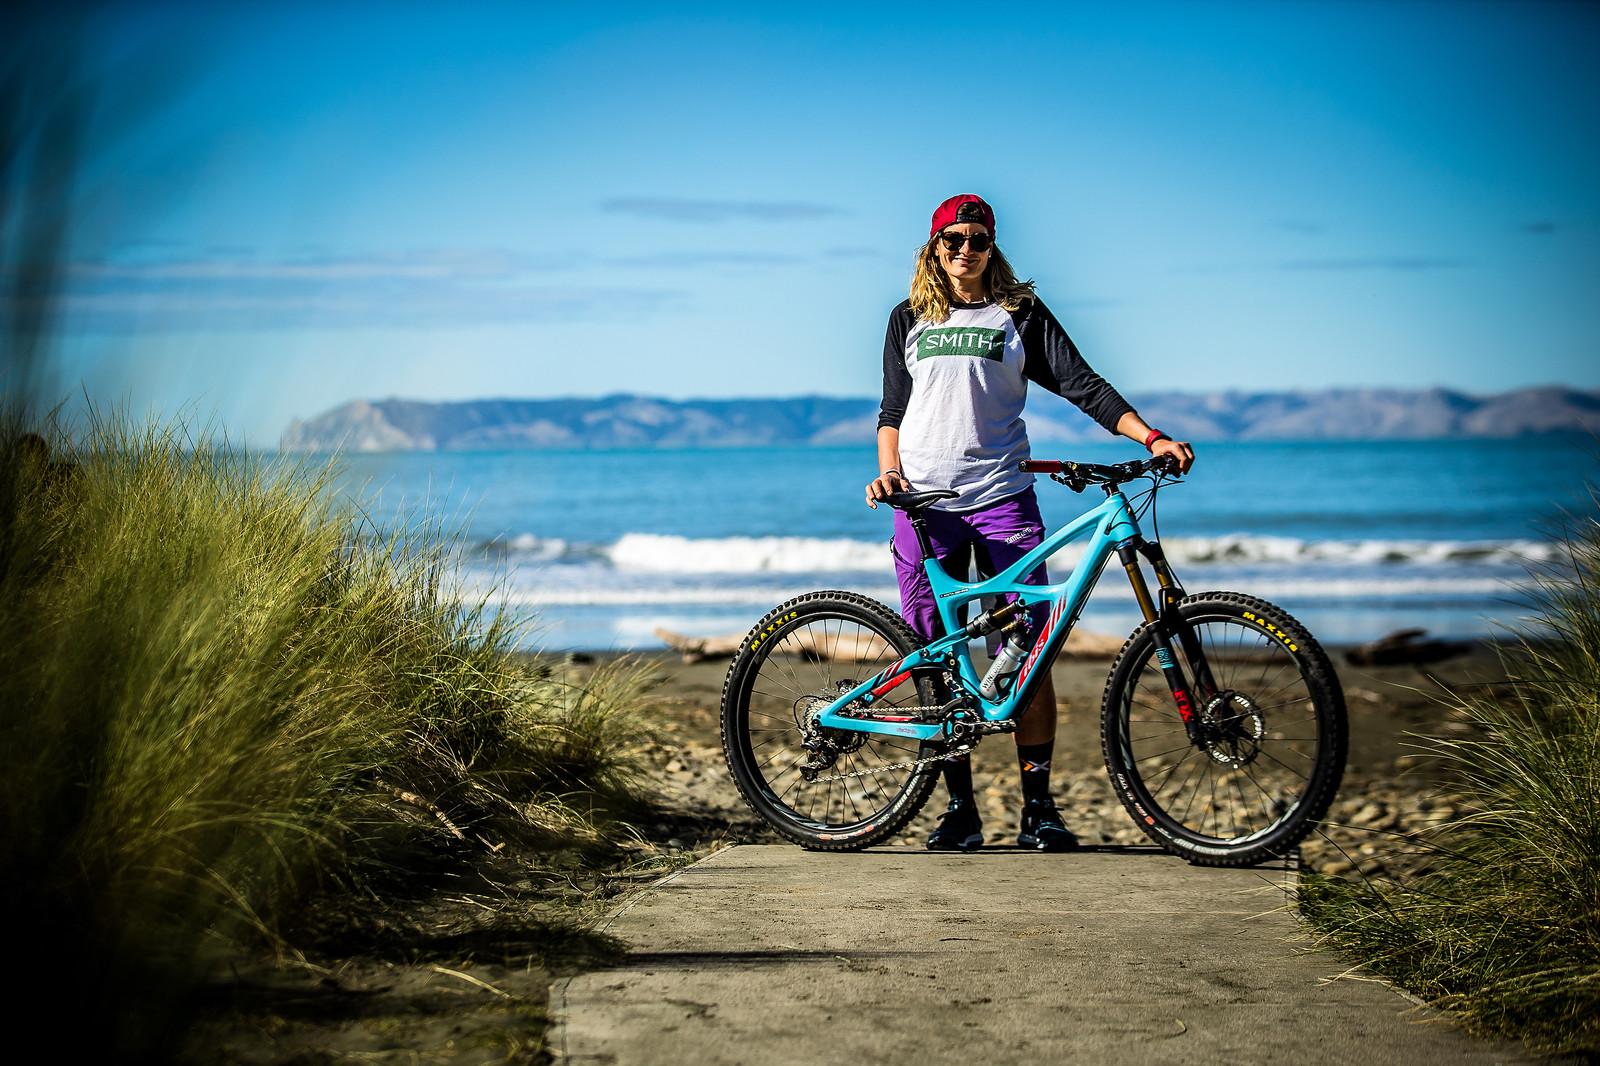 2017 NZ Enduro Pro Bikes - Anita Gehrig's Ibis Mojo HD - 2017 NZ Enduro Pro Bikes - They Wreck 'Em, We Check 'Em - Mountain Biking Pictures - Vital MTB